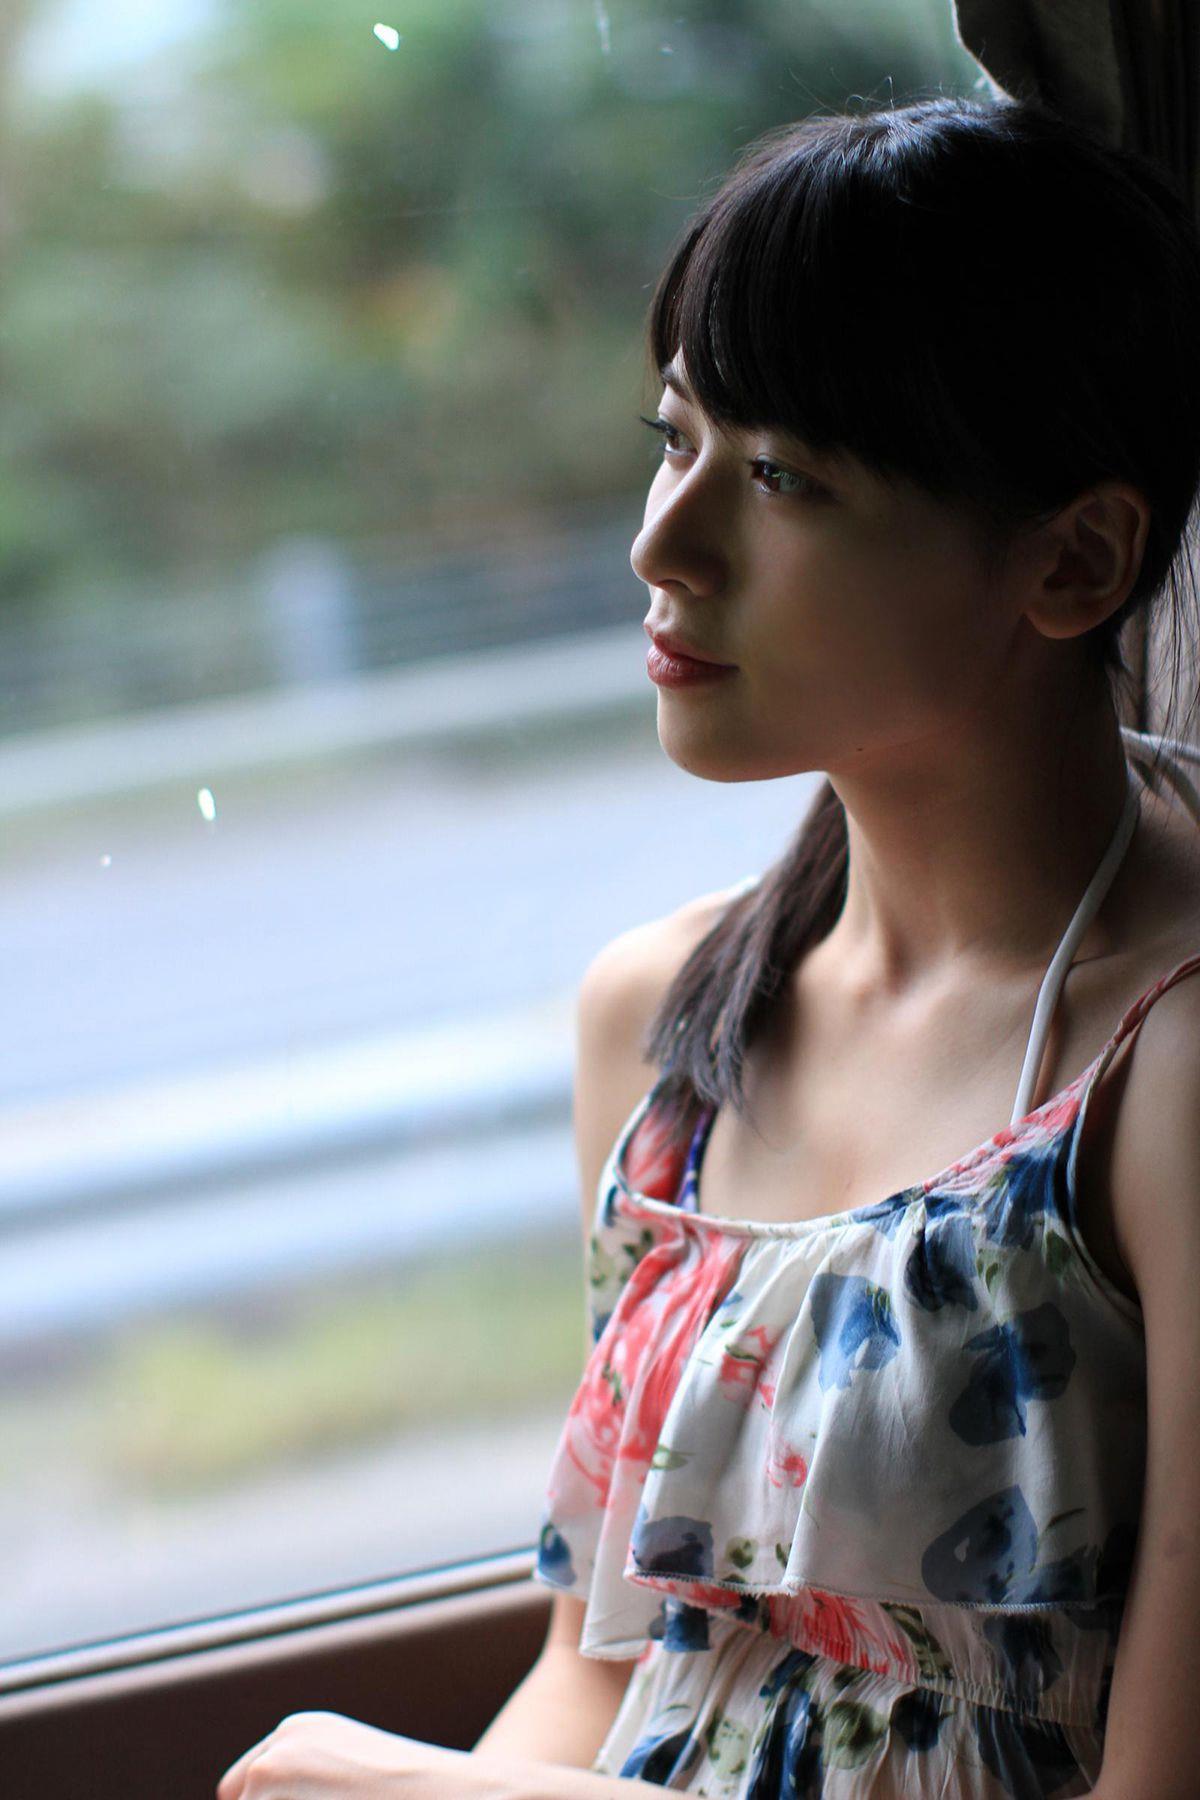 矢島舞美 エロ画像 4